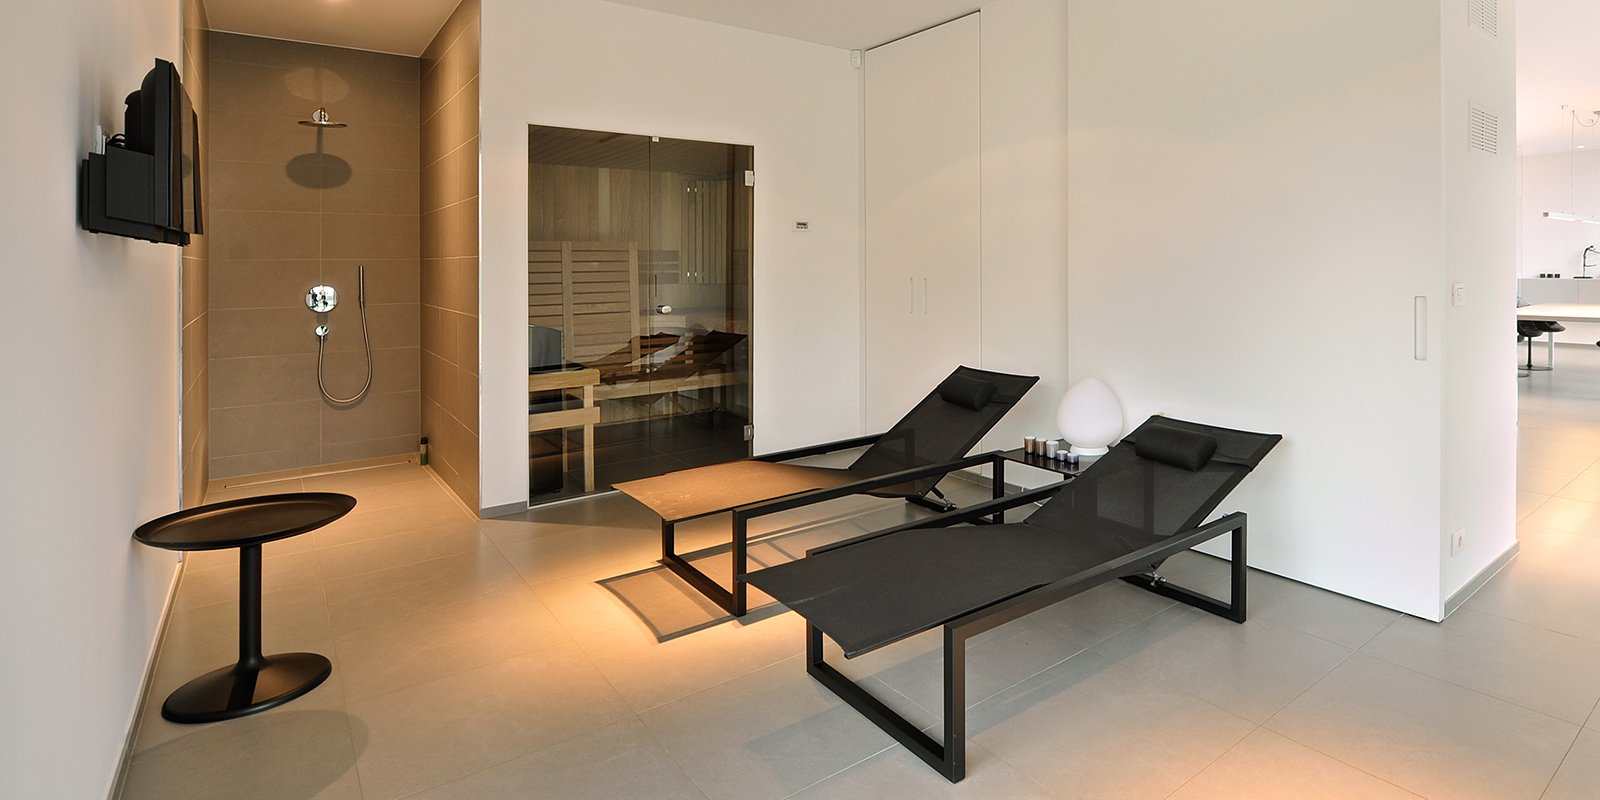 Keuken achterwand, Architects in Motion, Strakke keuken, Bar, Natuursteen, Graniet, Minimalistische keuken, Eettafel, Lange eettafel, Witte eettafel